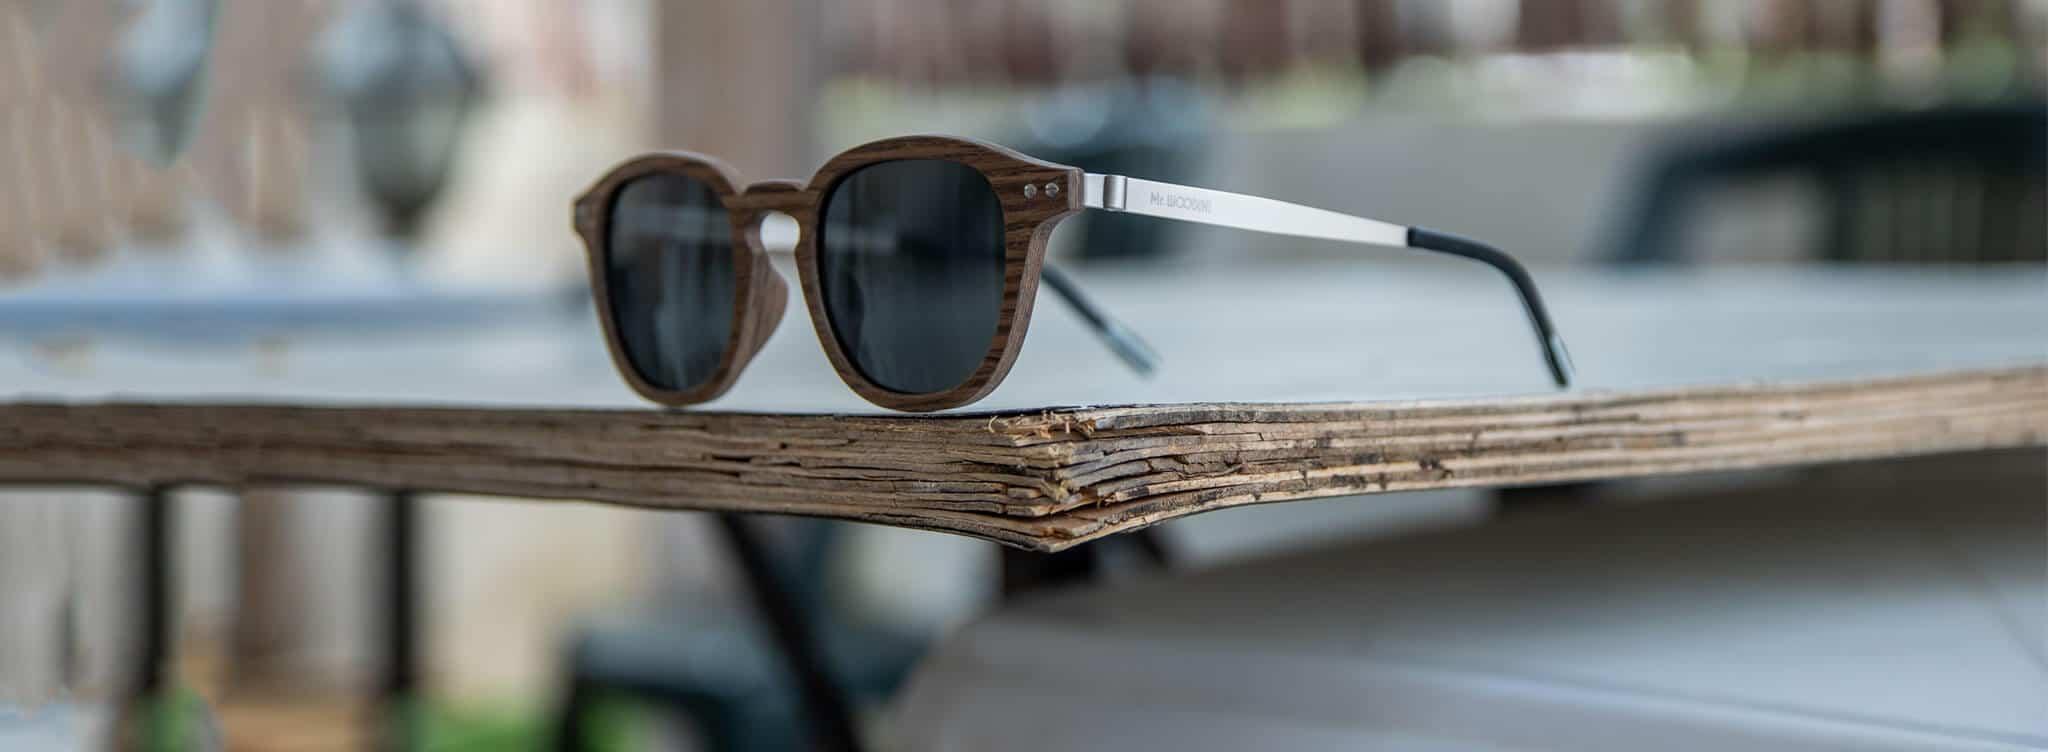 Mr. Woodini Eyewear - Wooden Sunglasses